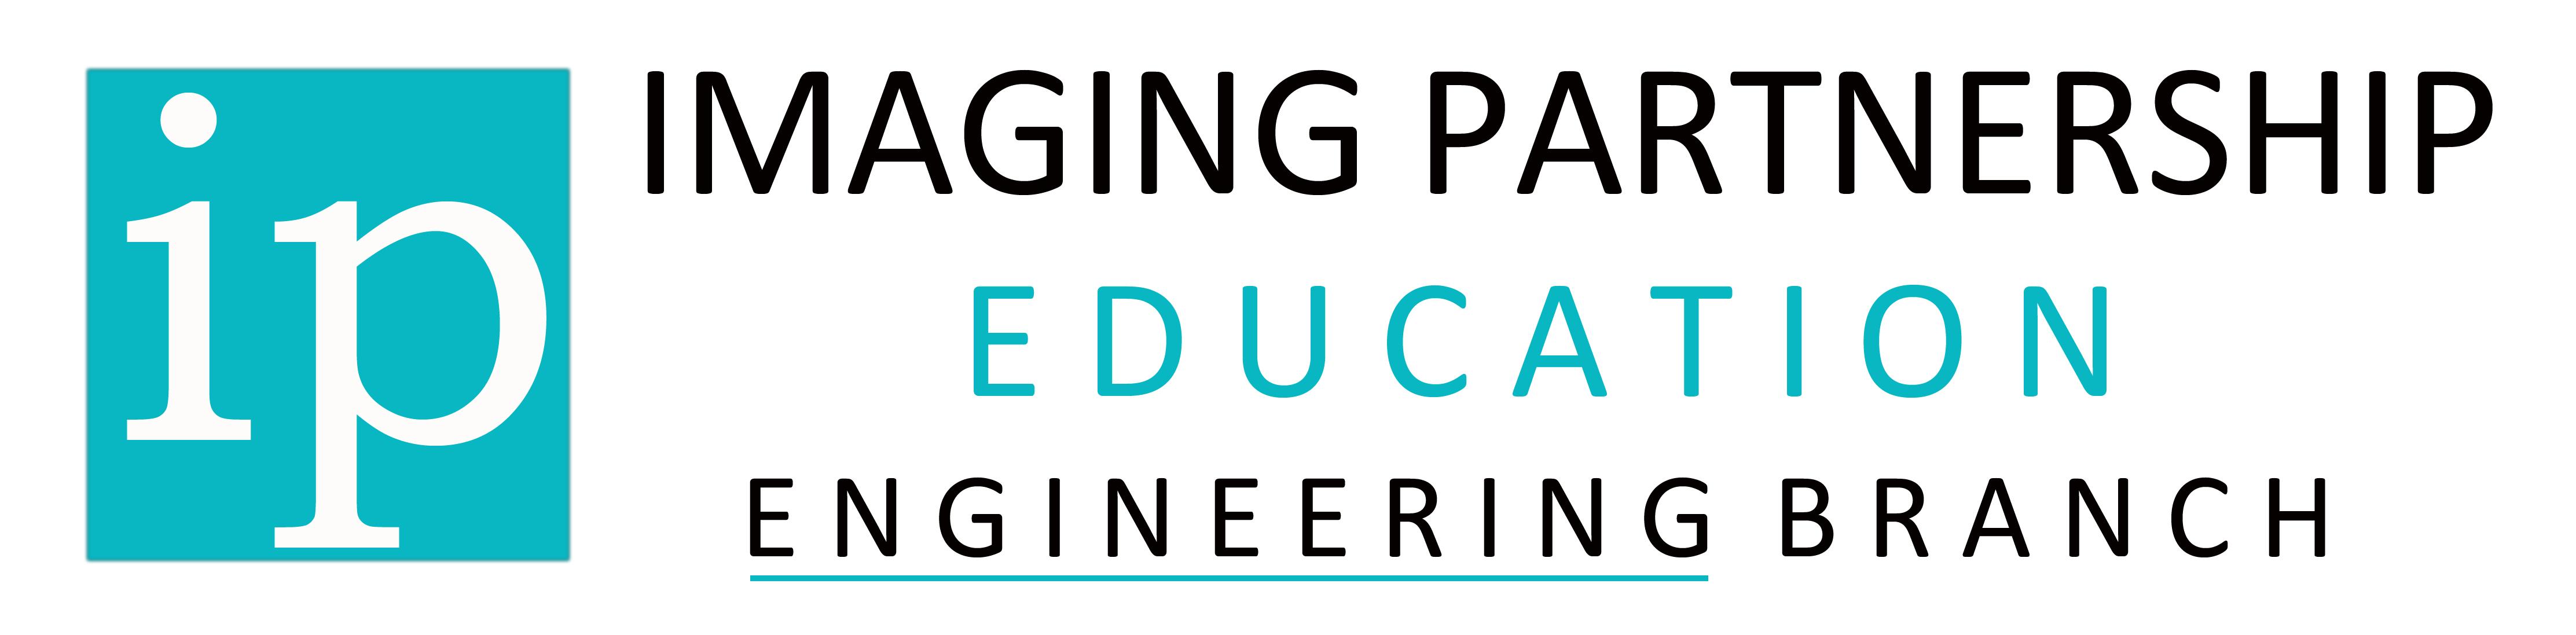 ip-education-engineering-branch